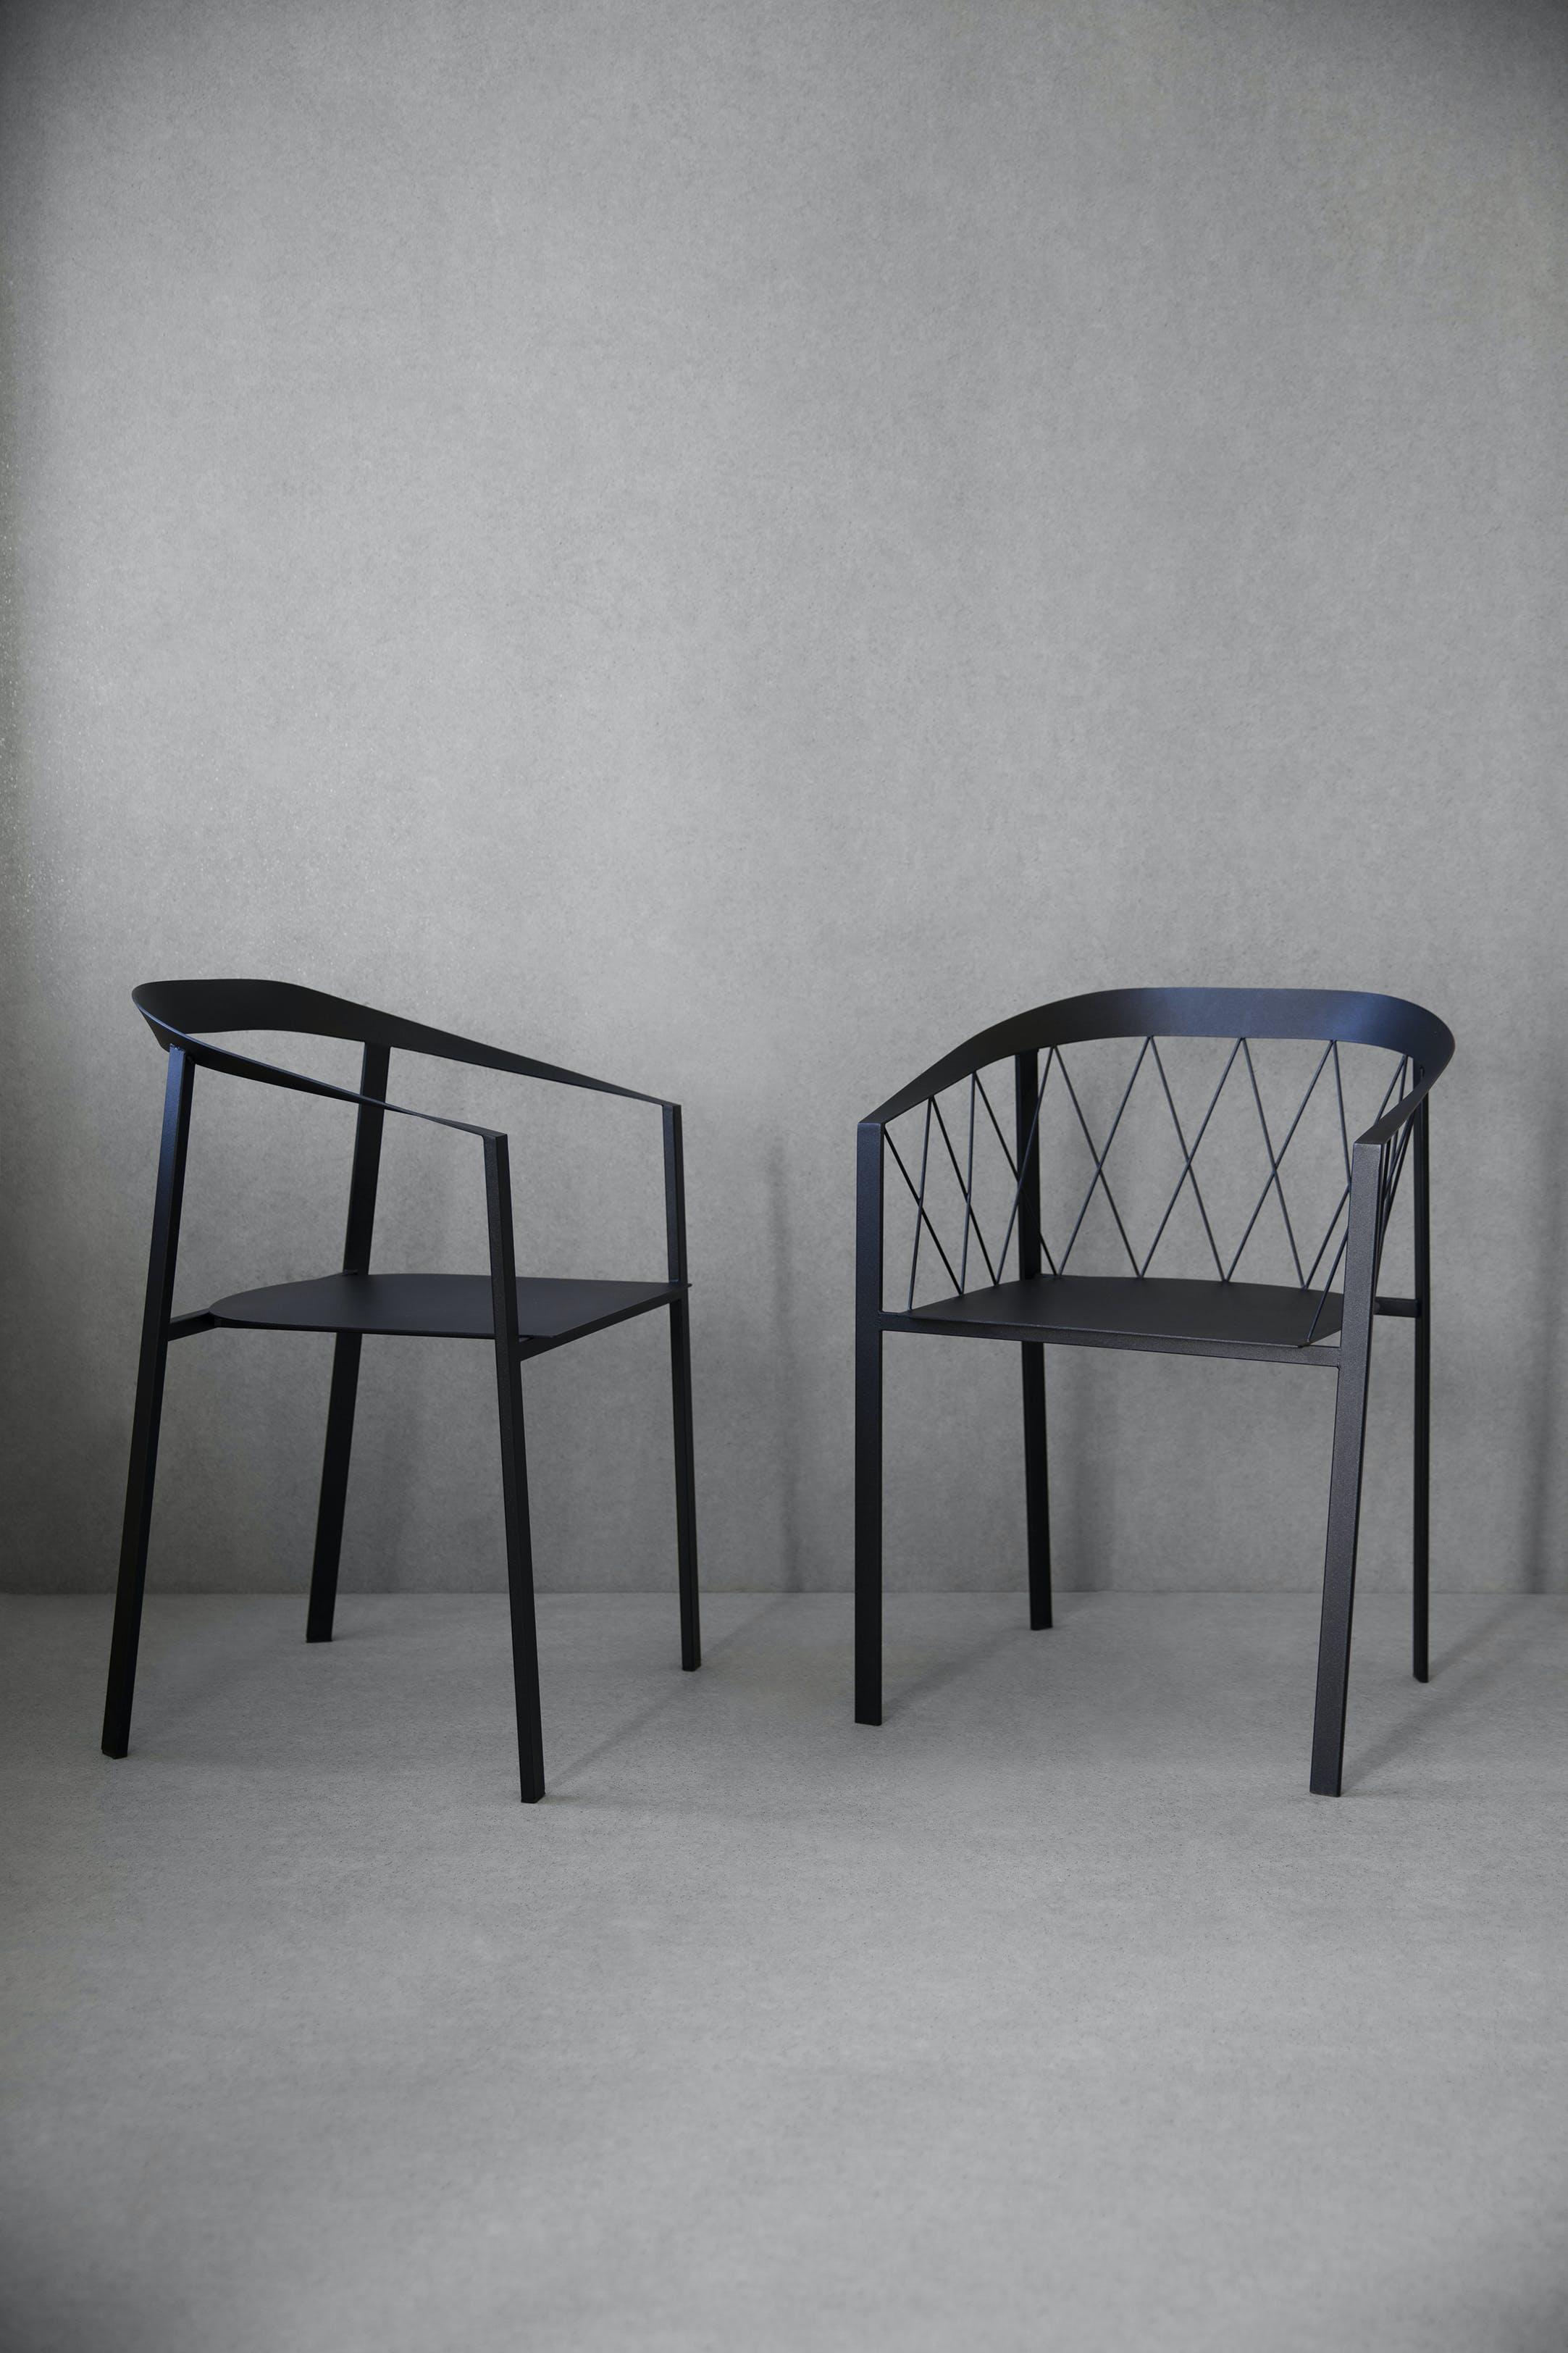 My Chair Series